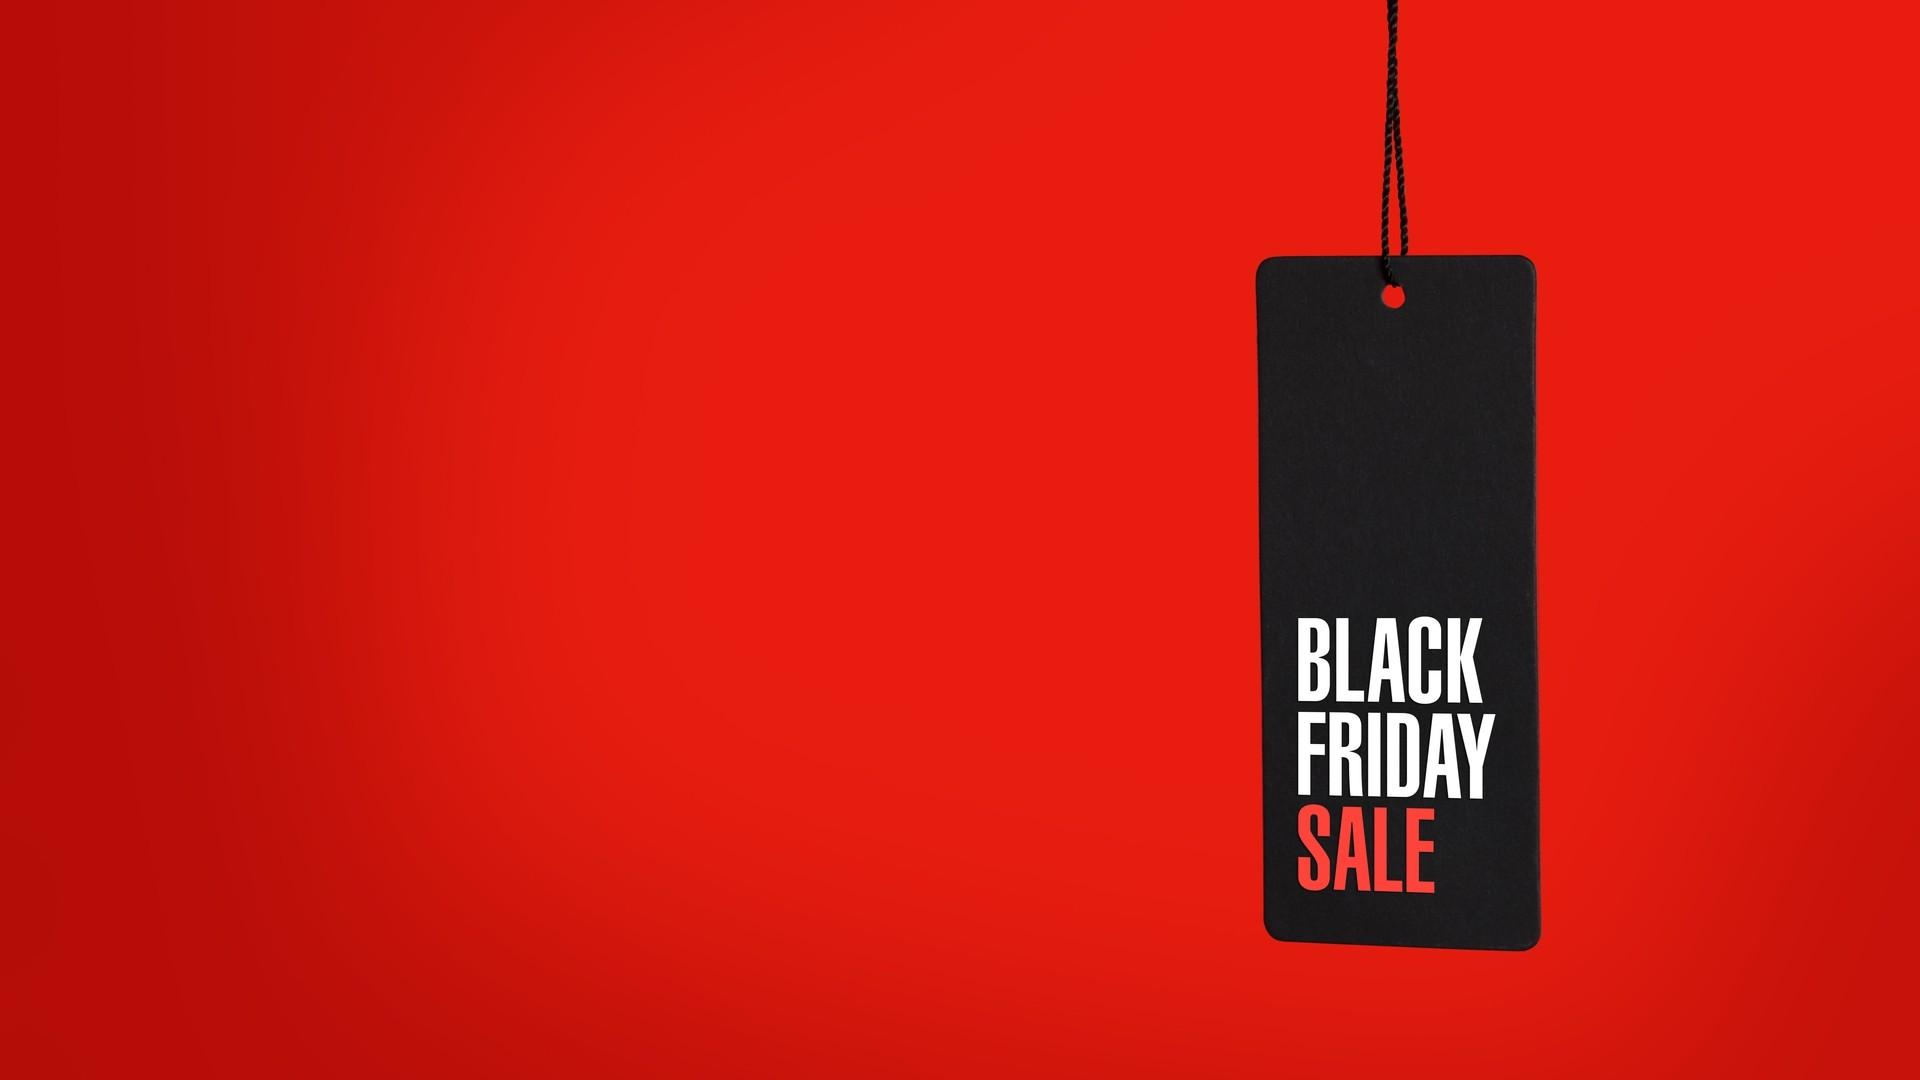 Black Friday computer wallpaper